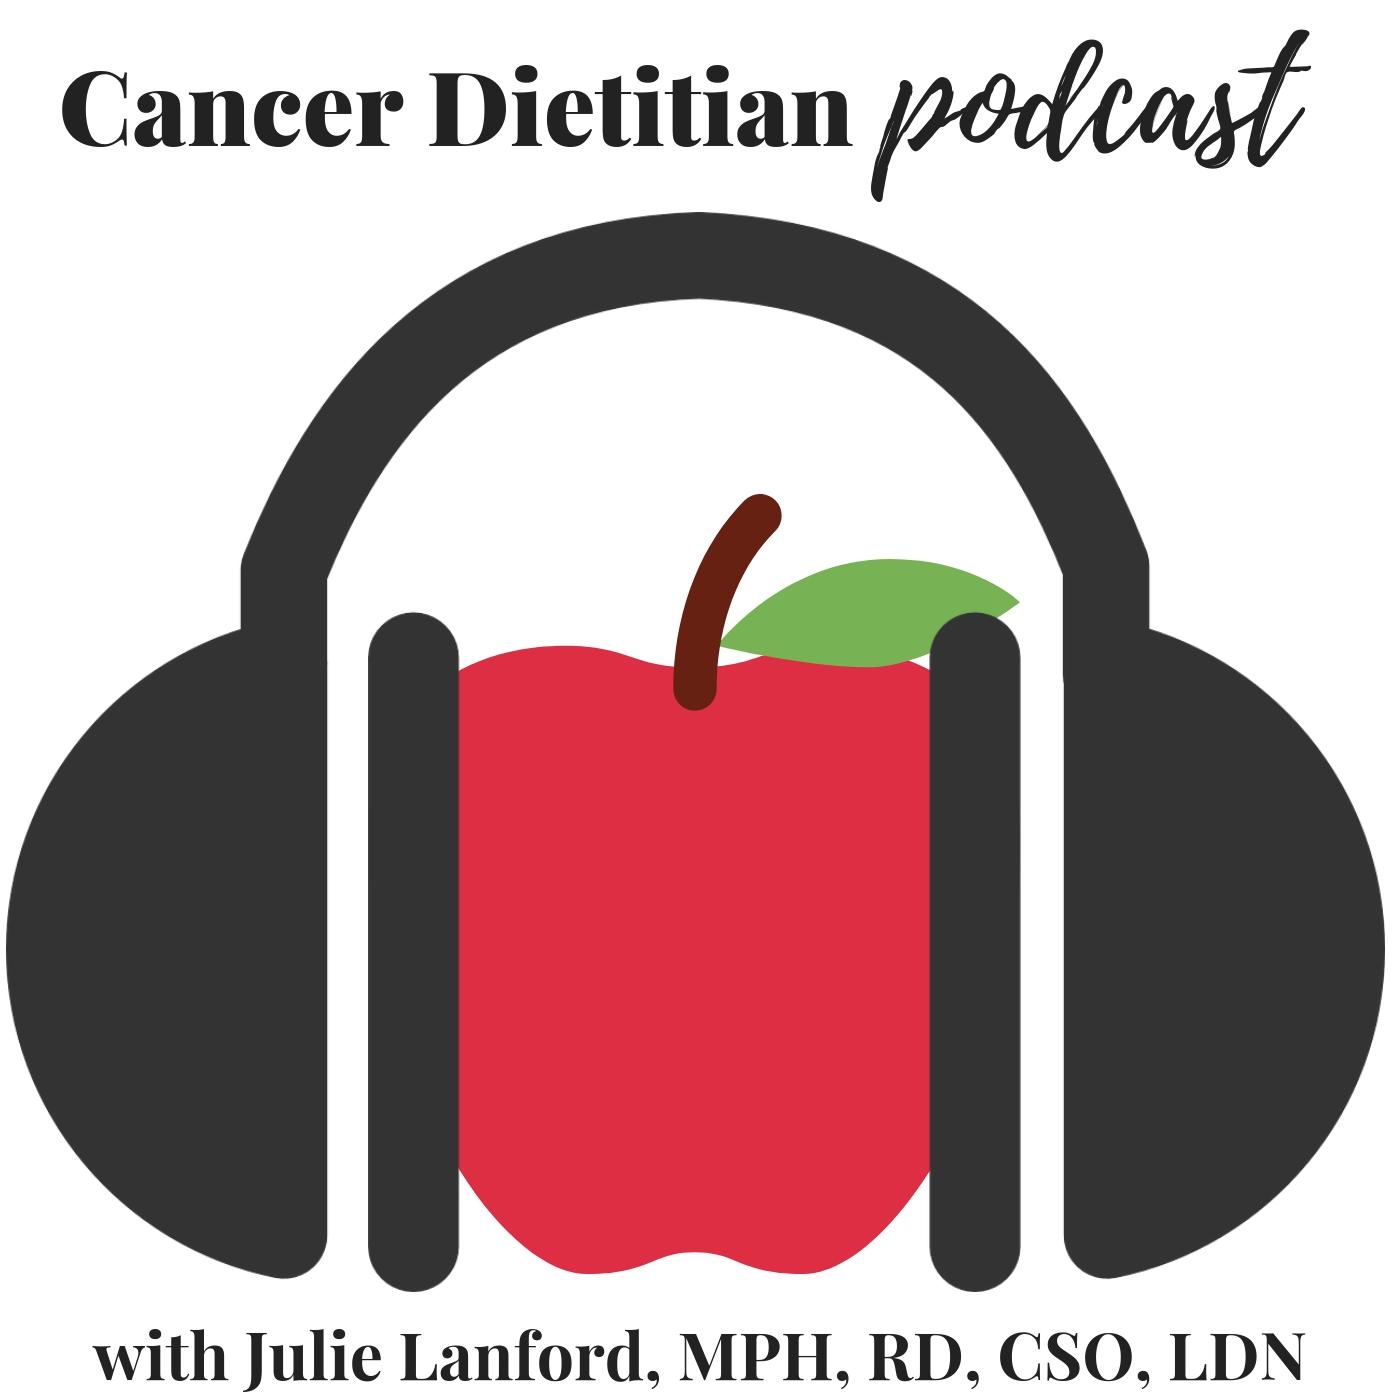 Acid/Alkaline Diet for Cancer? The Evidence, or Lack of